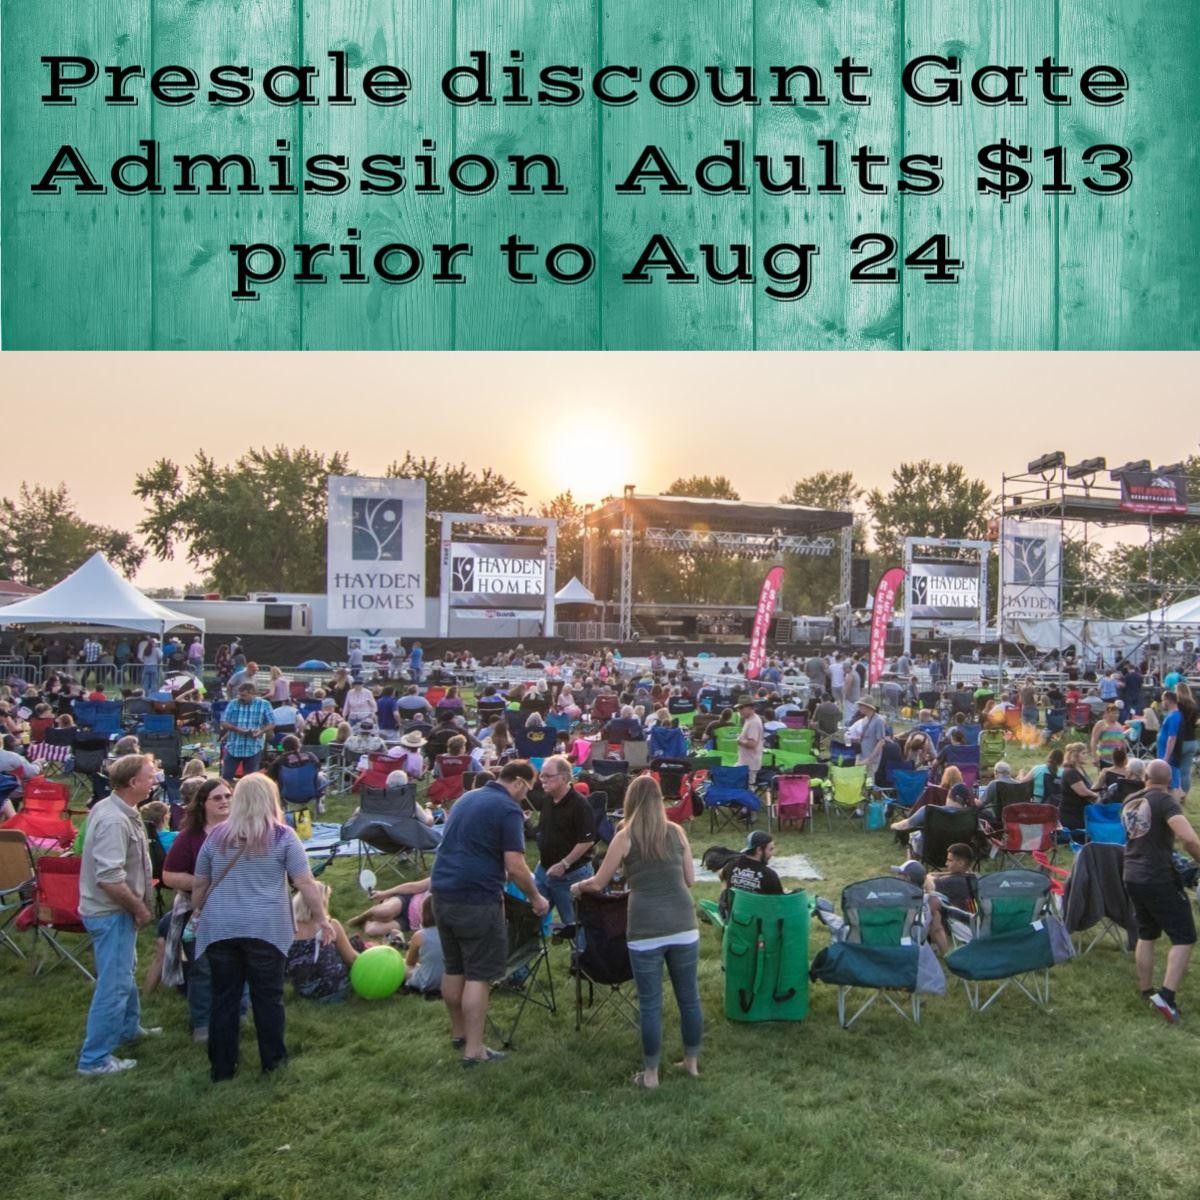 Presale Admission $12 prior to Aug 24